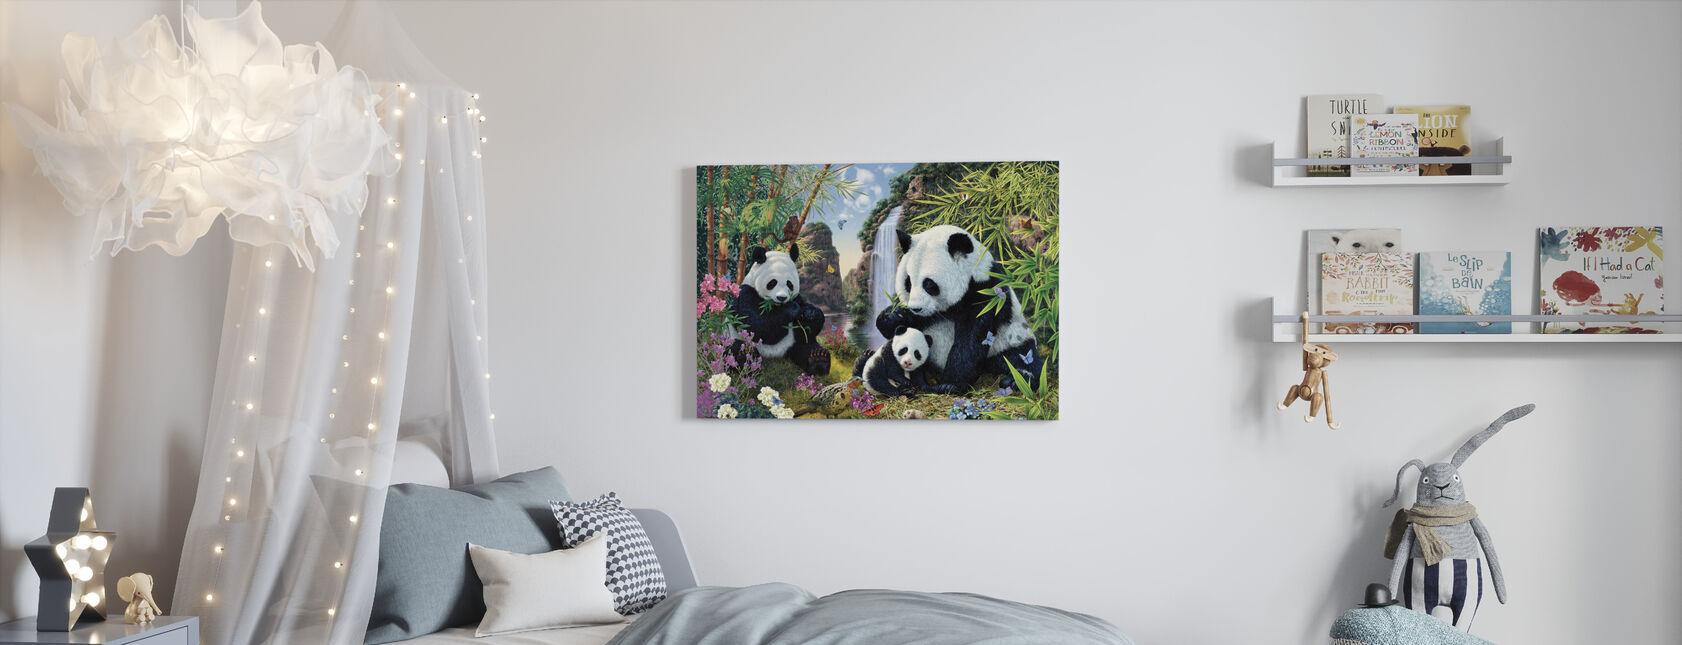 Panda-vallei - Canvas print - Kinderkamer